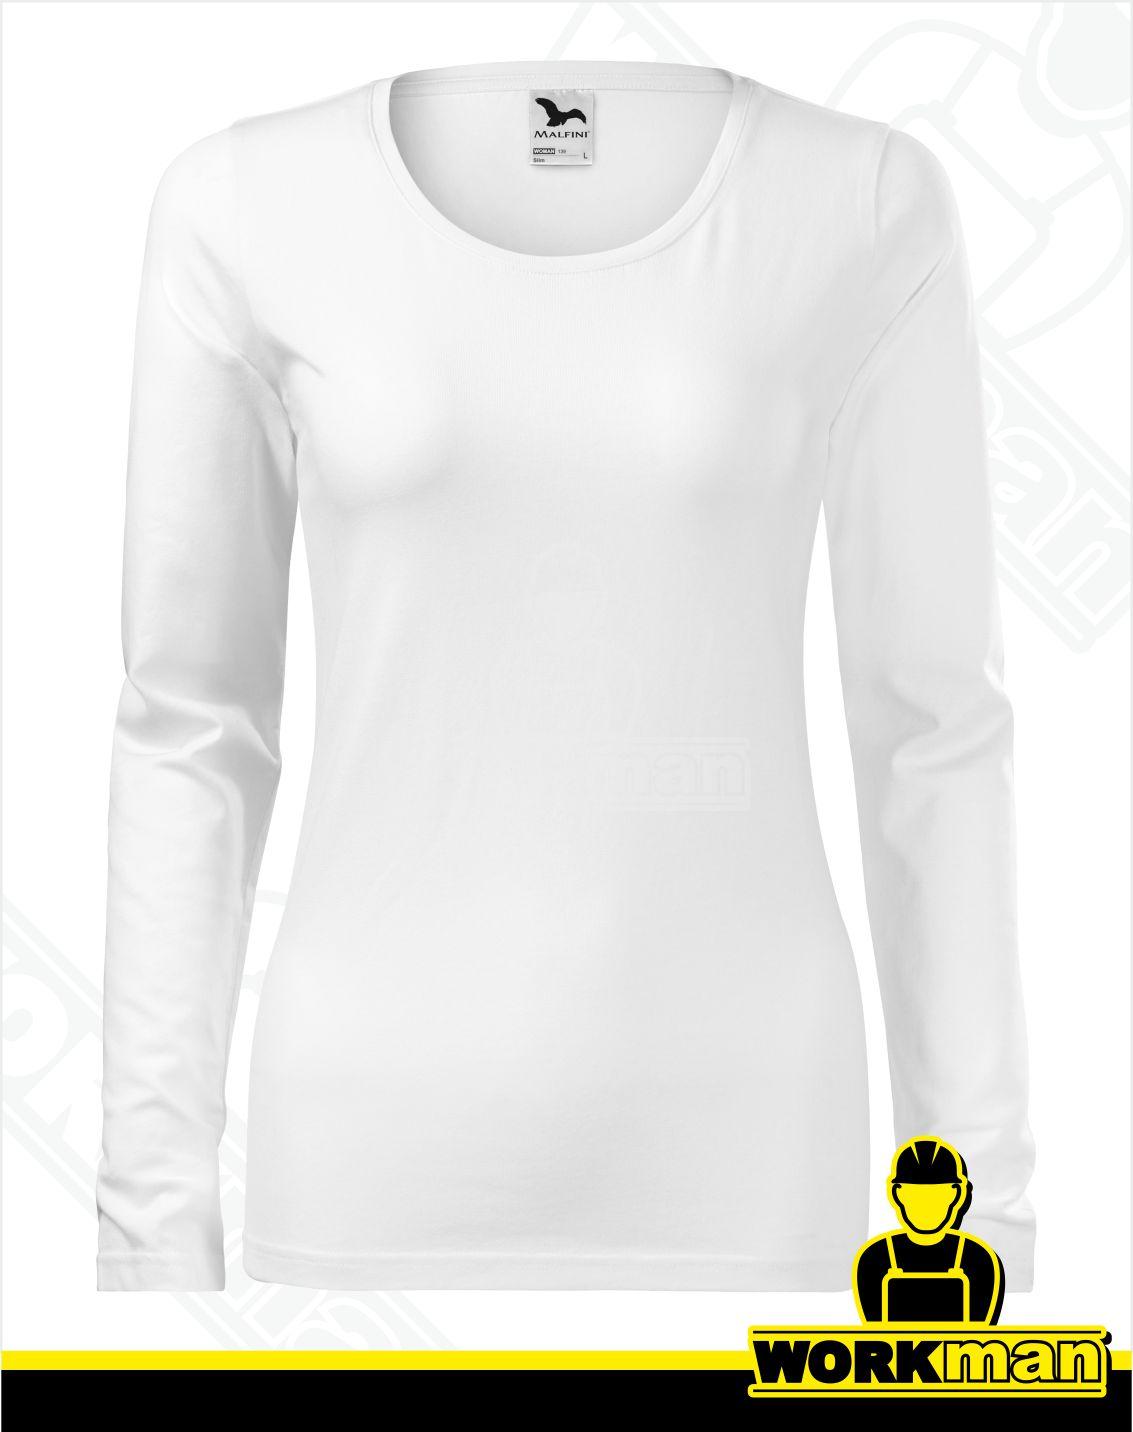 6771b2fd561a Dámske tričko SLIM Malfini biela Pracovné odevy WORKMAN